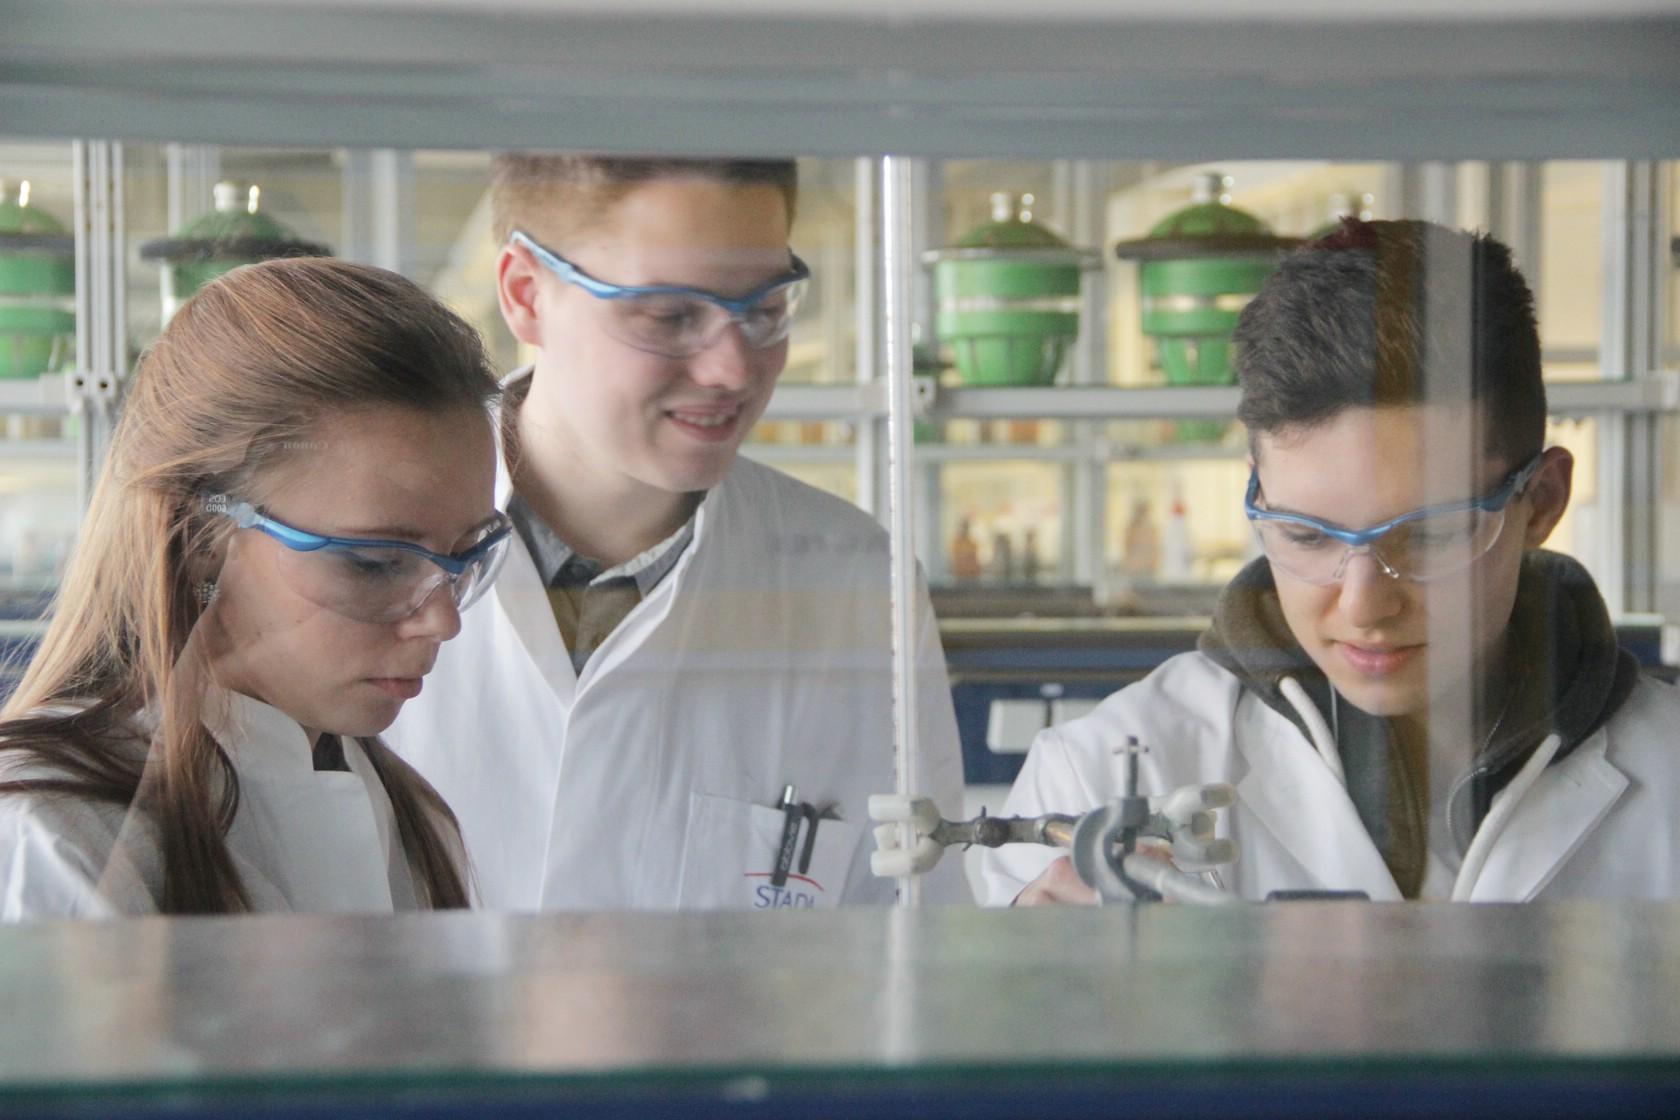 Ask a student - Pharmazie Teilnehmende beim Experiment 3/3 (Foto: Ramona Dabringer)